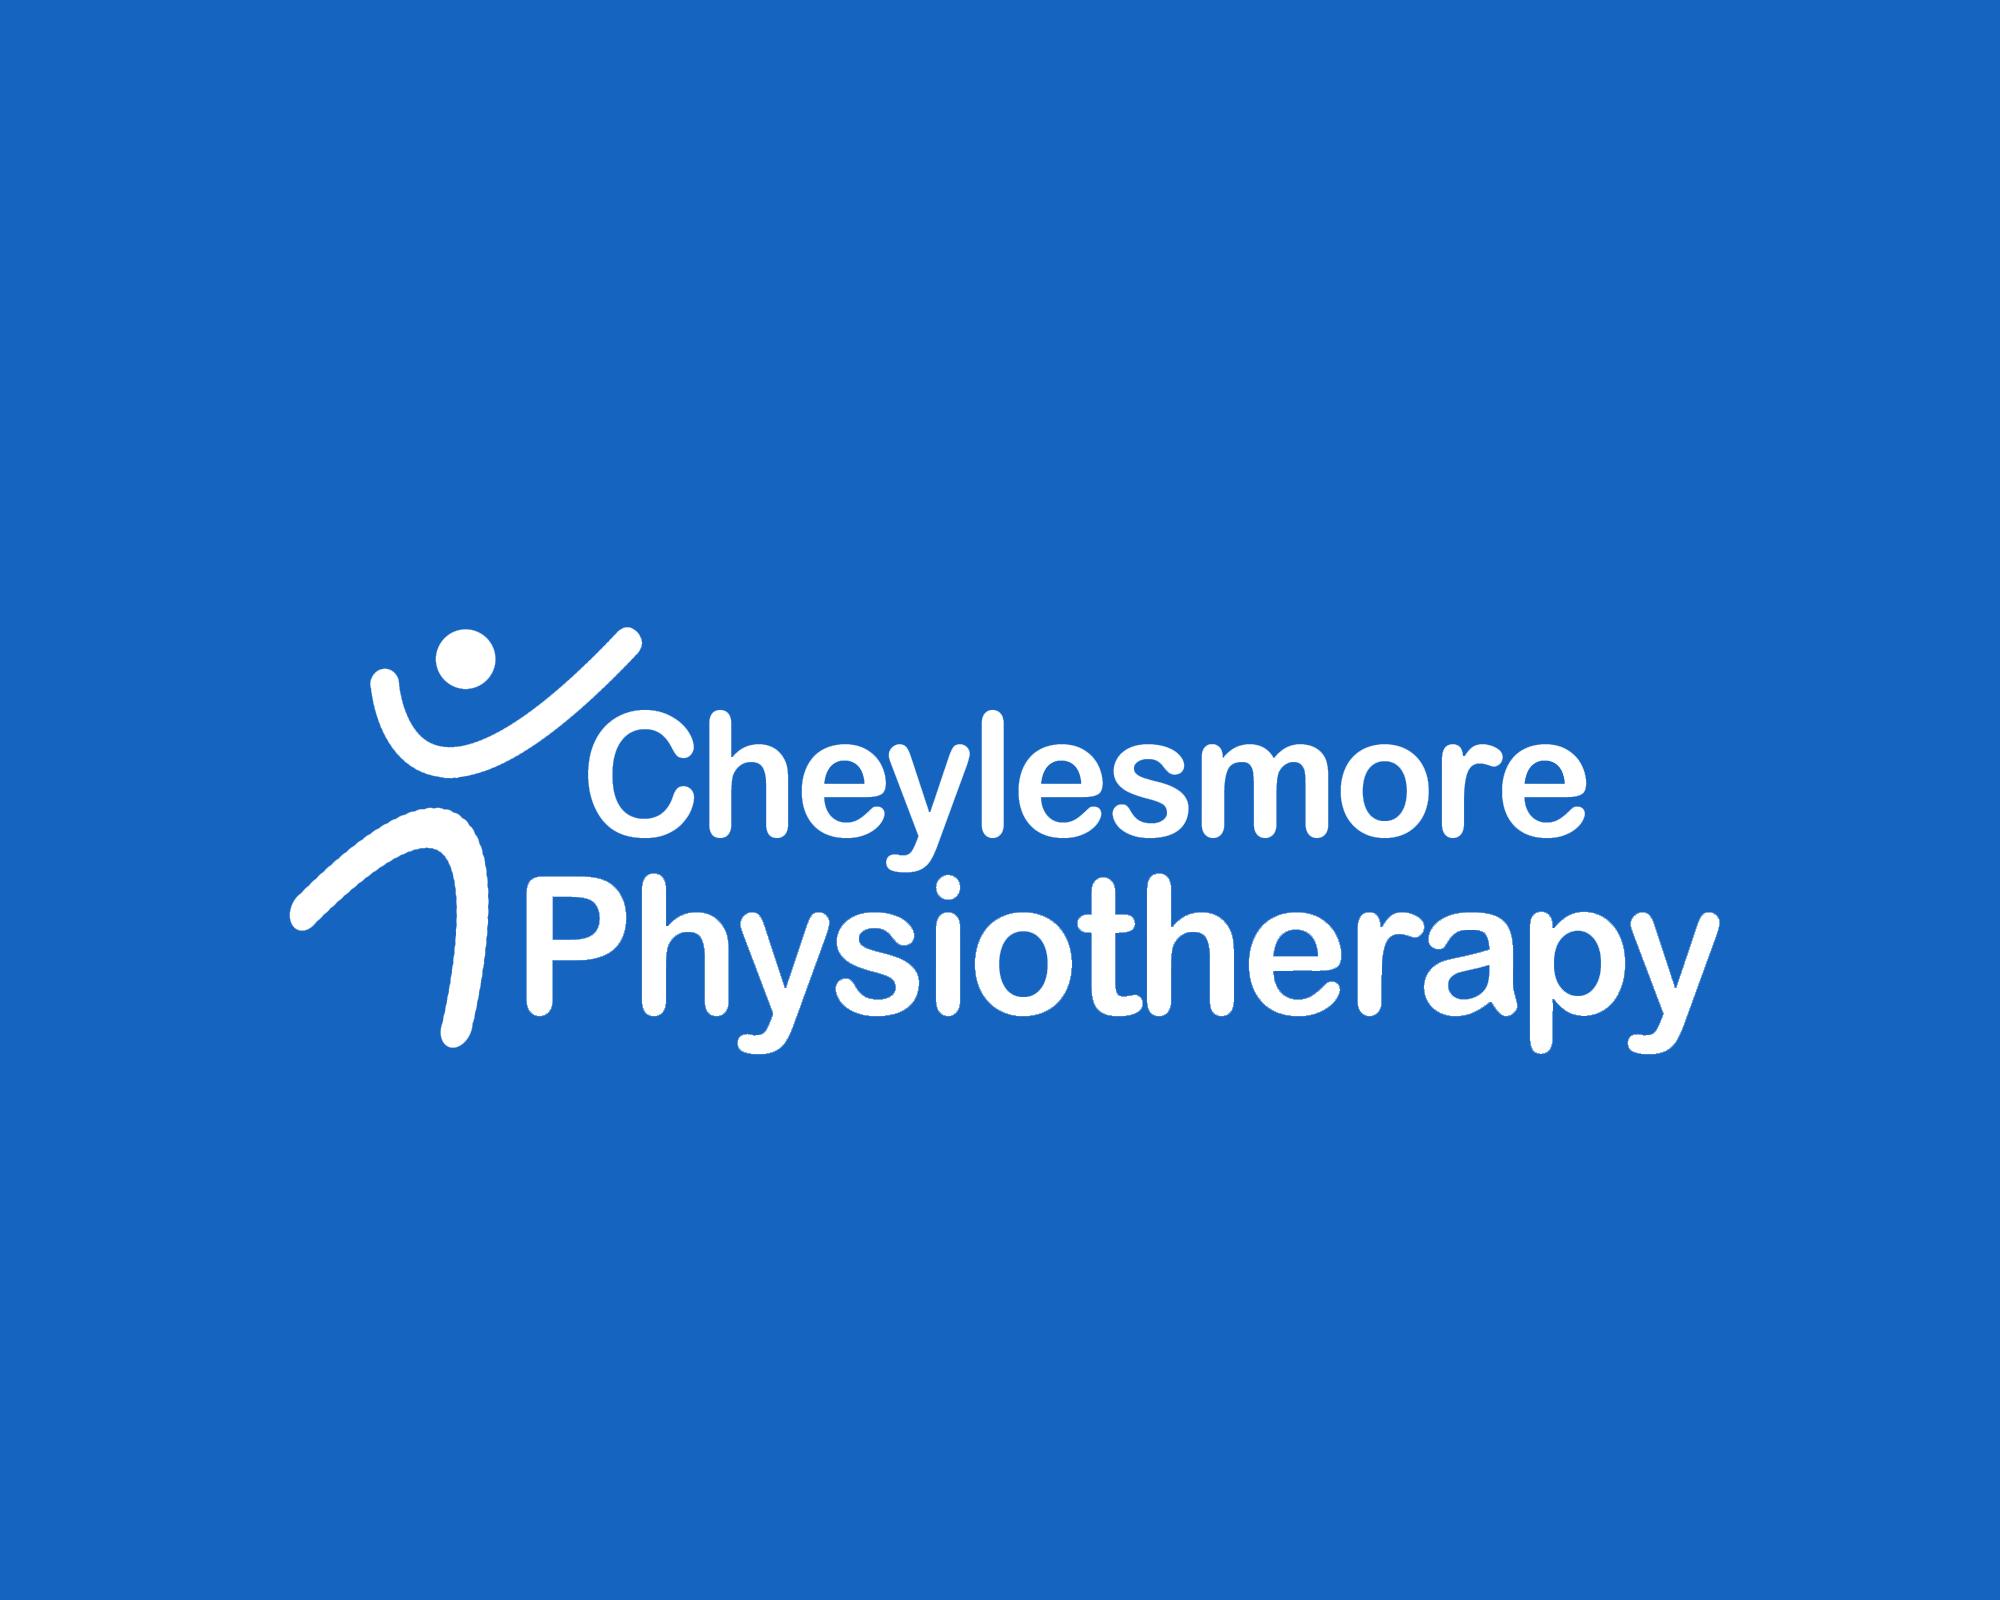 cheylesmore physiotherapy Logo